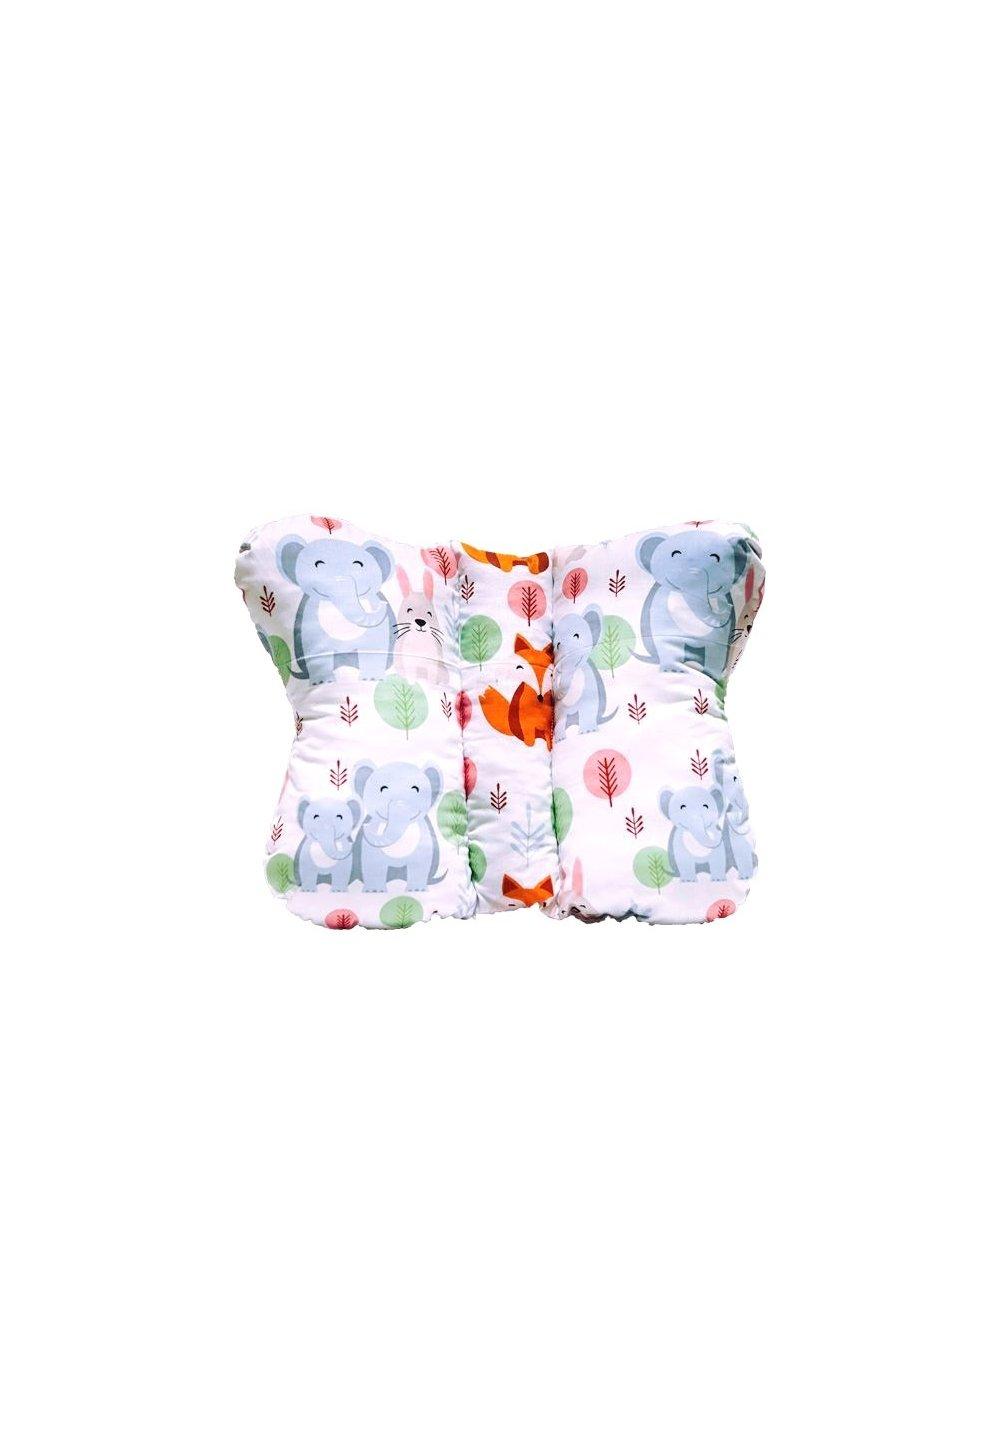 Perna fluturas, Vulpita si elefantelul imagine